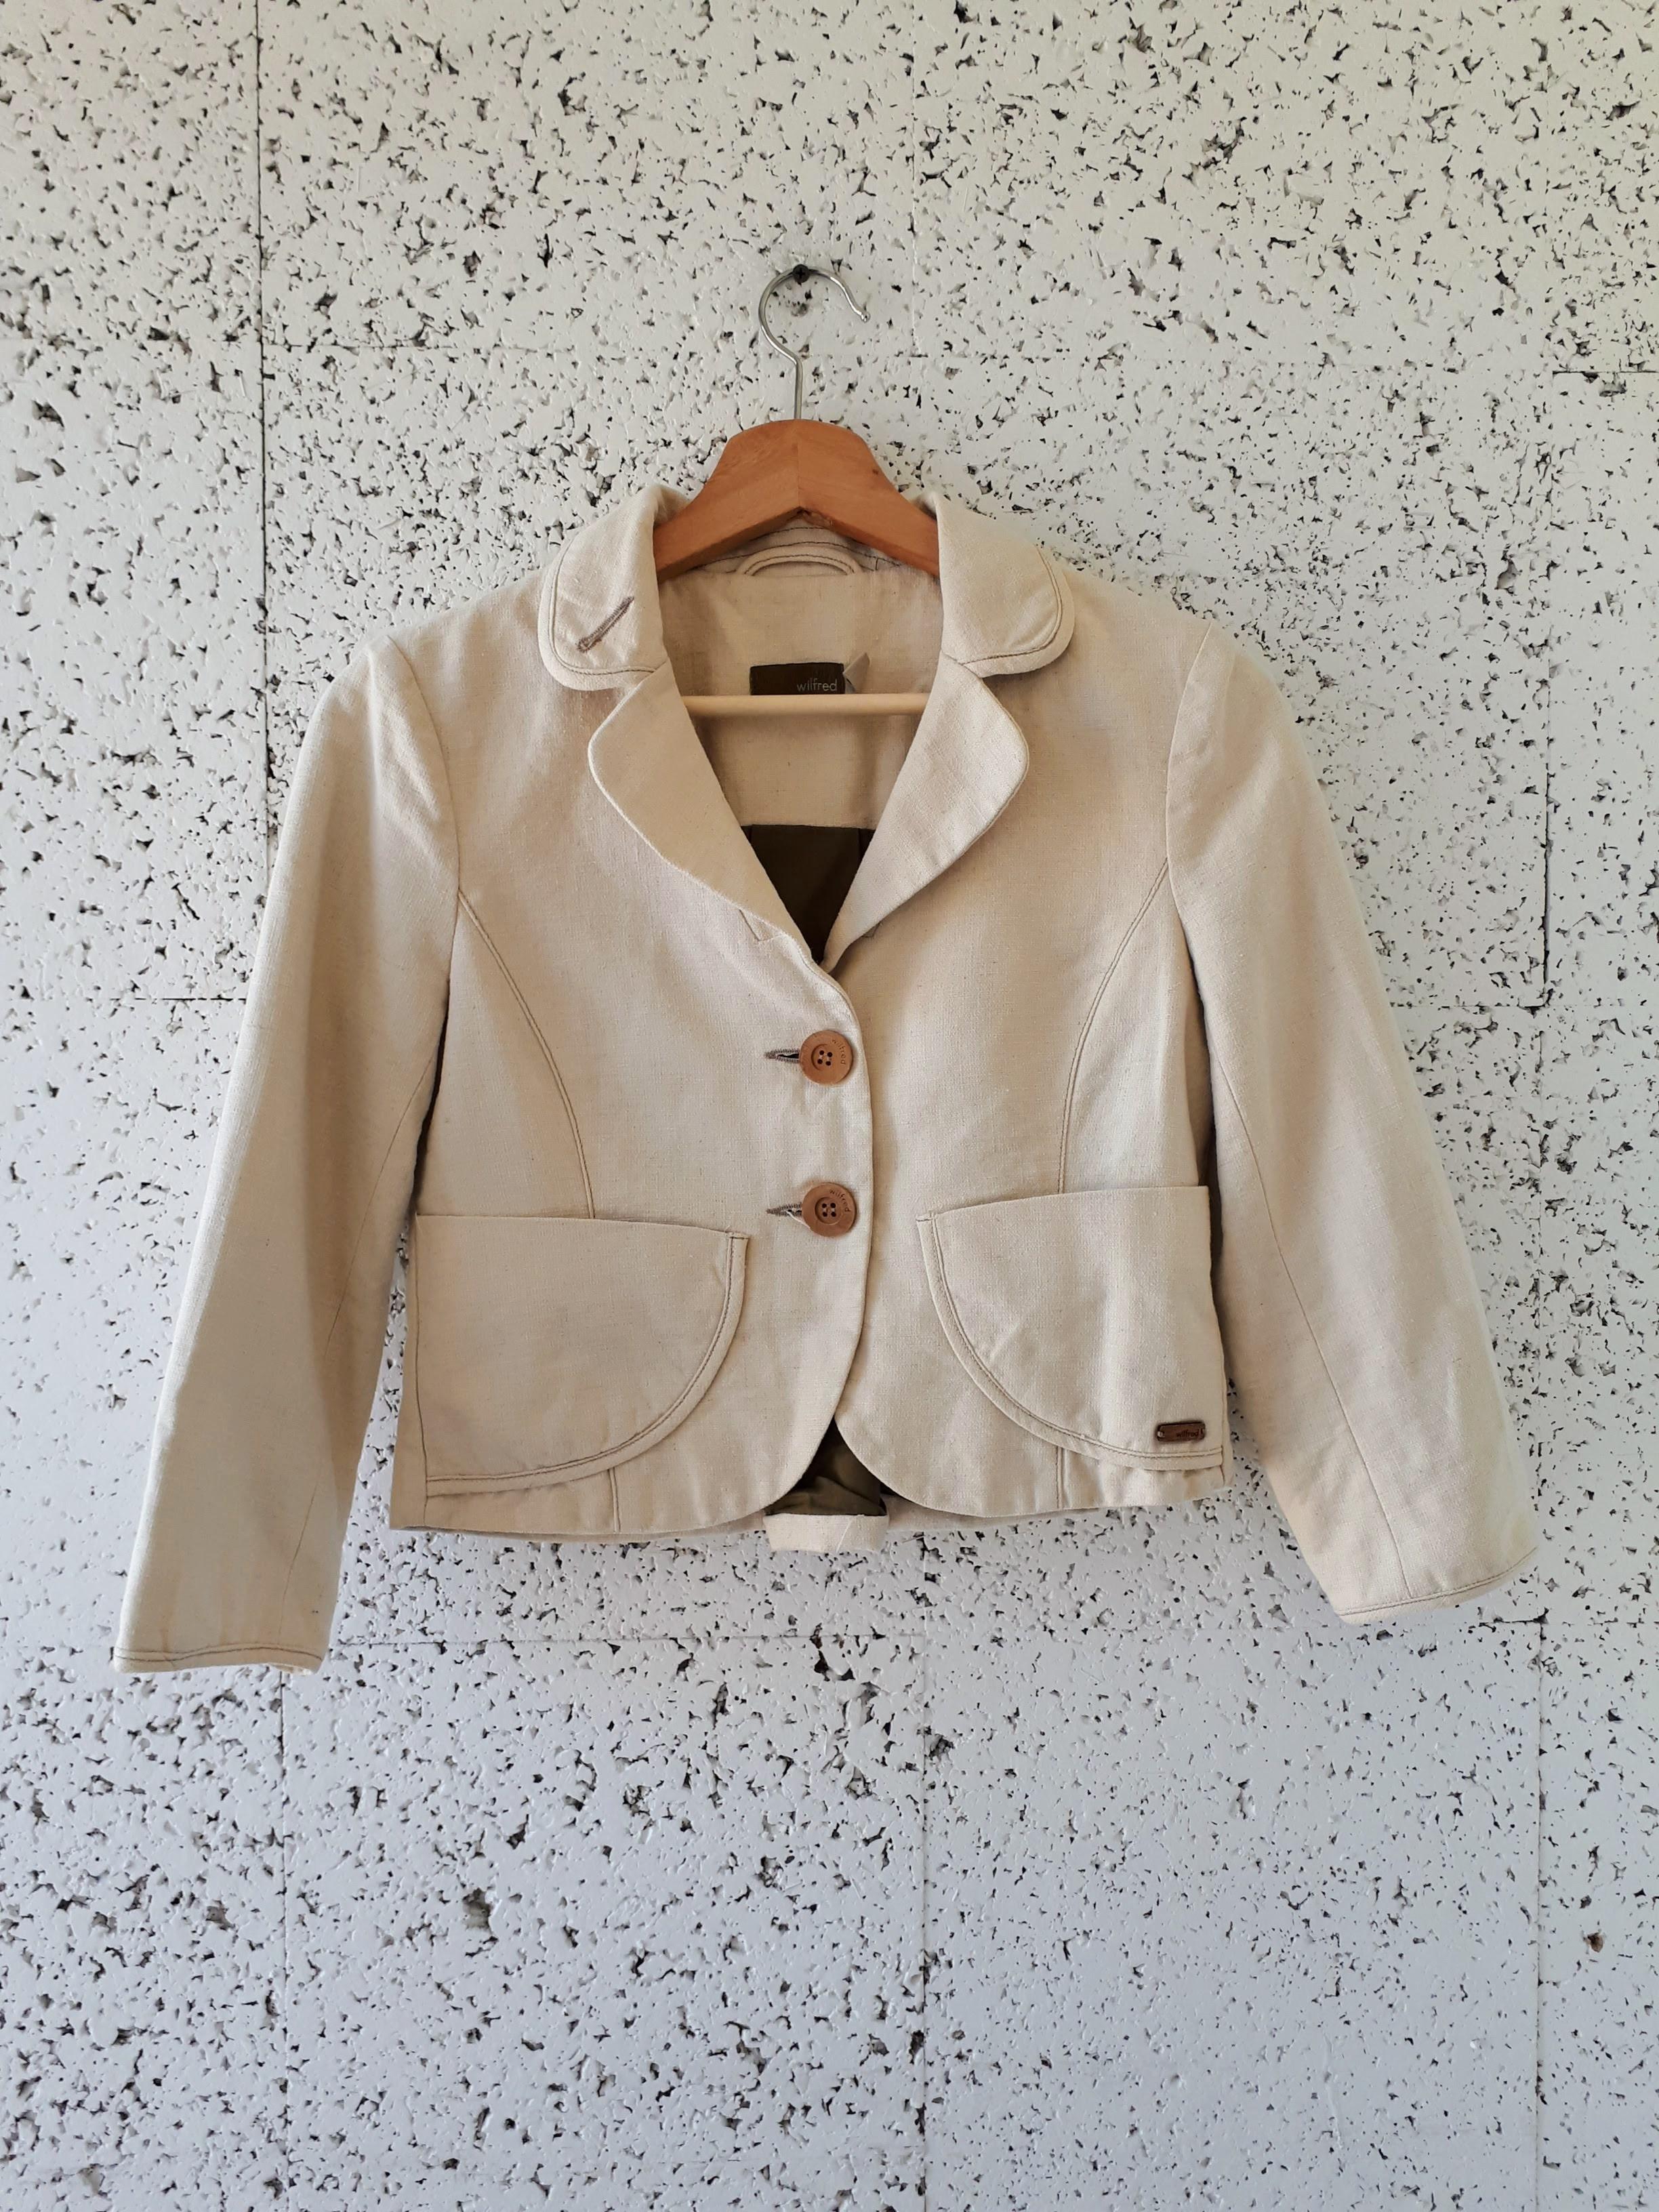 Wilfred jacket; Size XS, $38